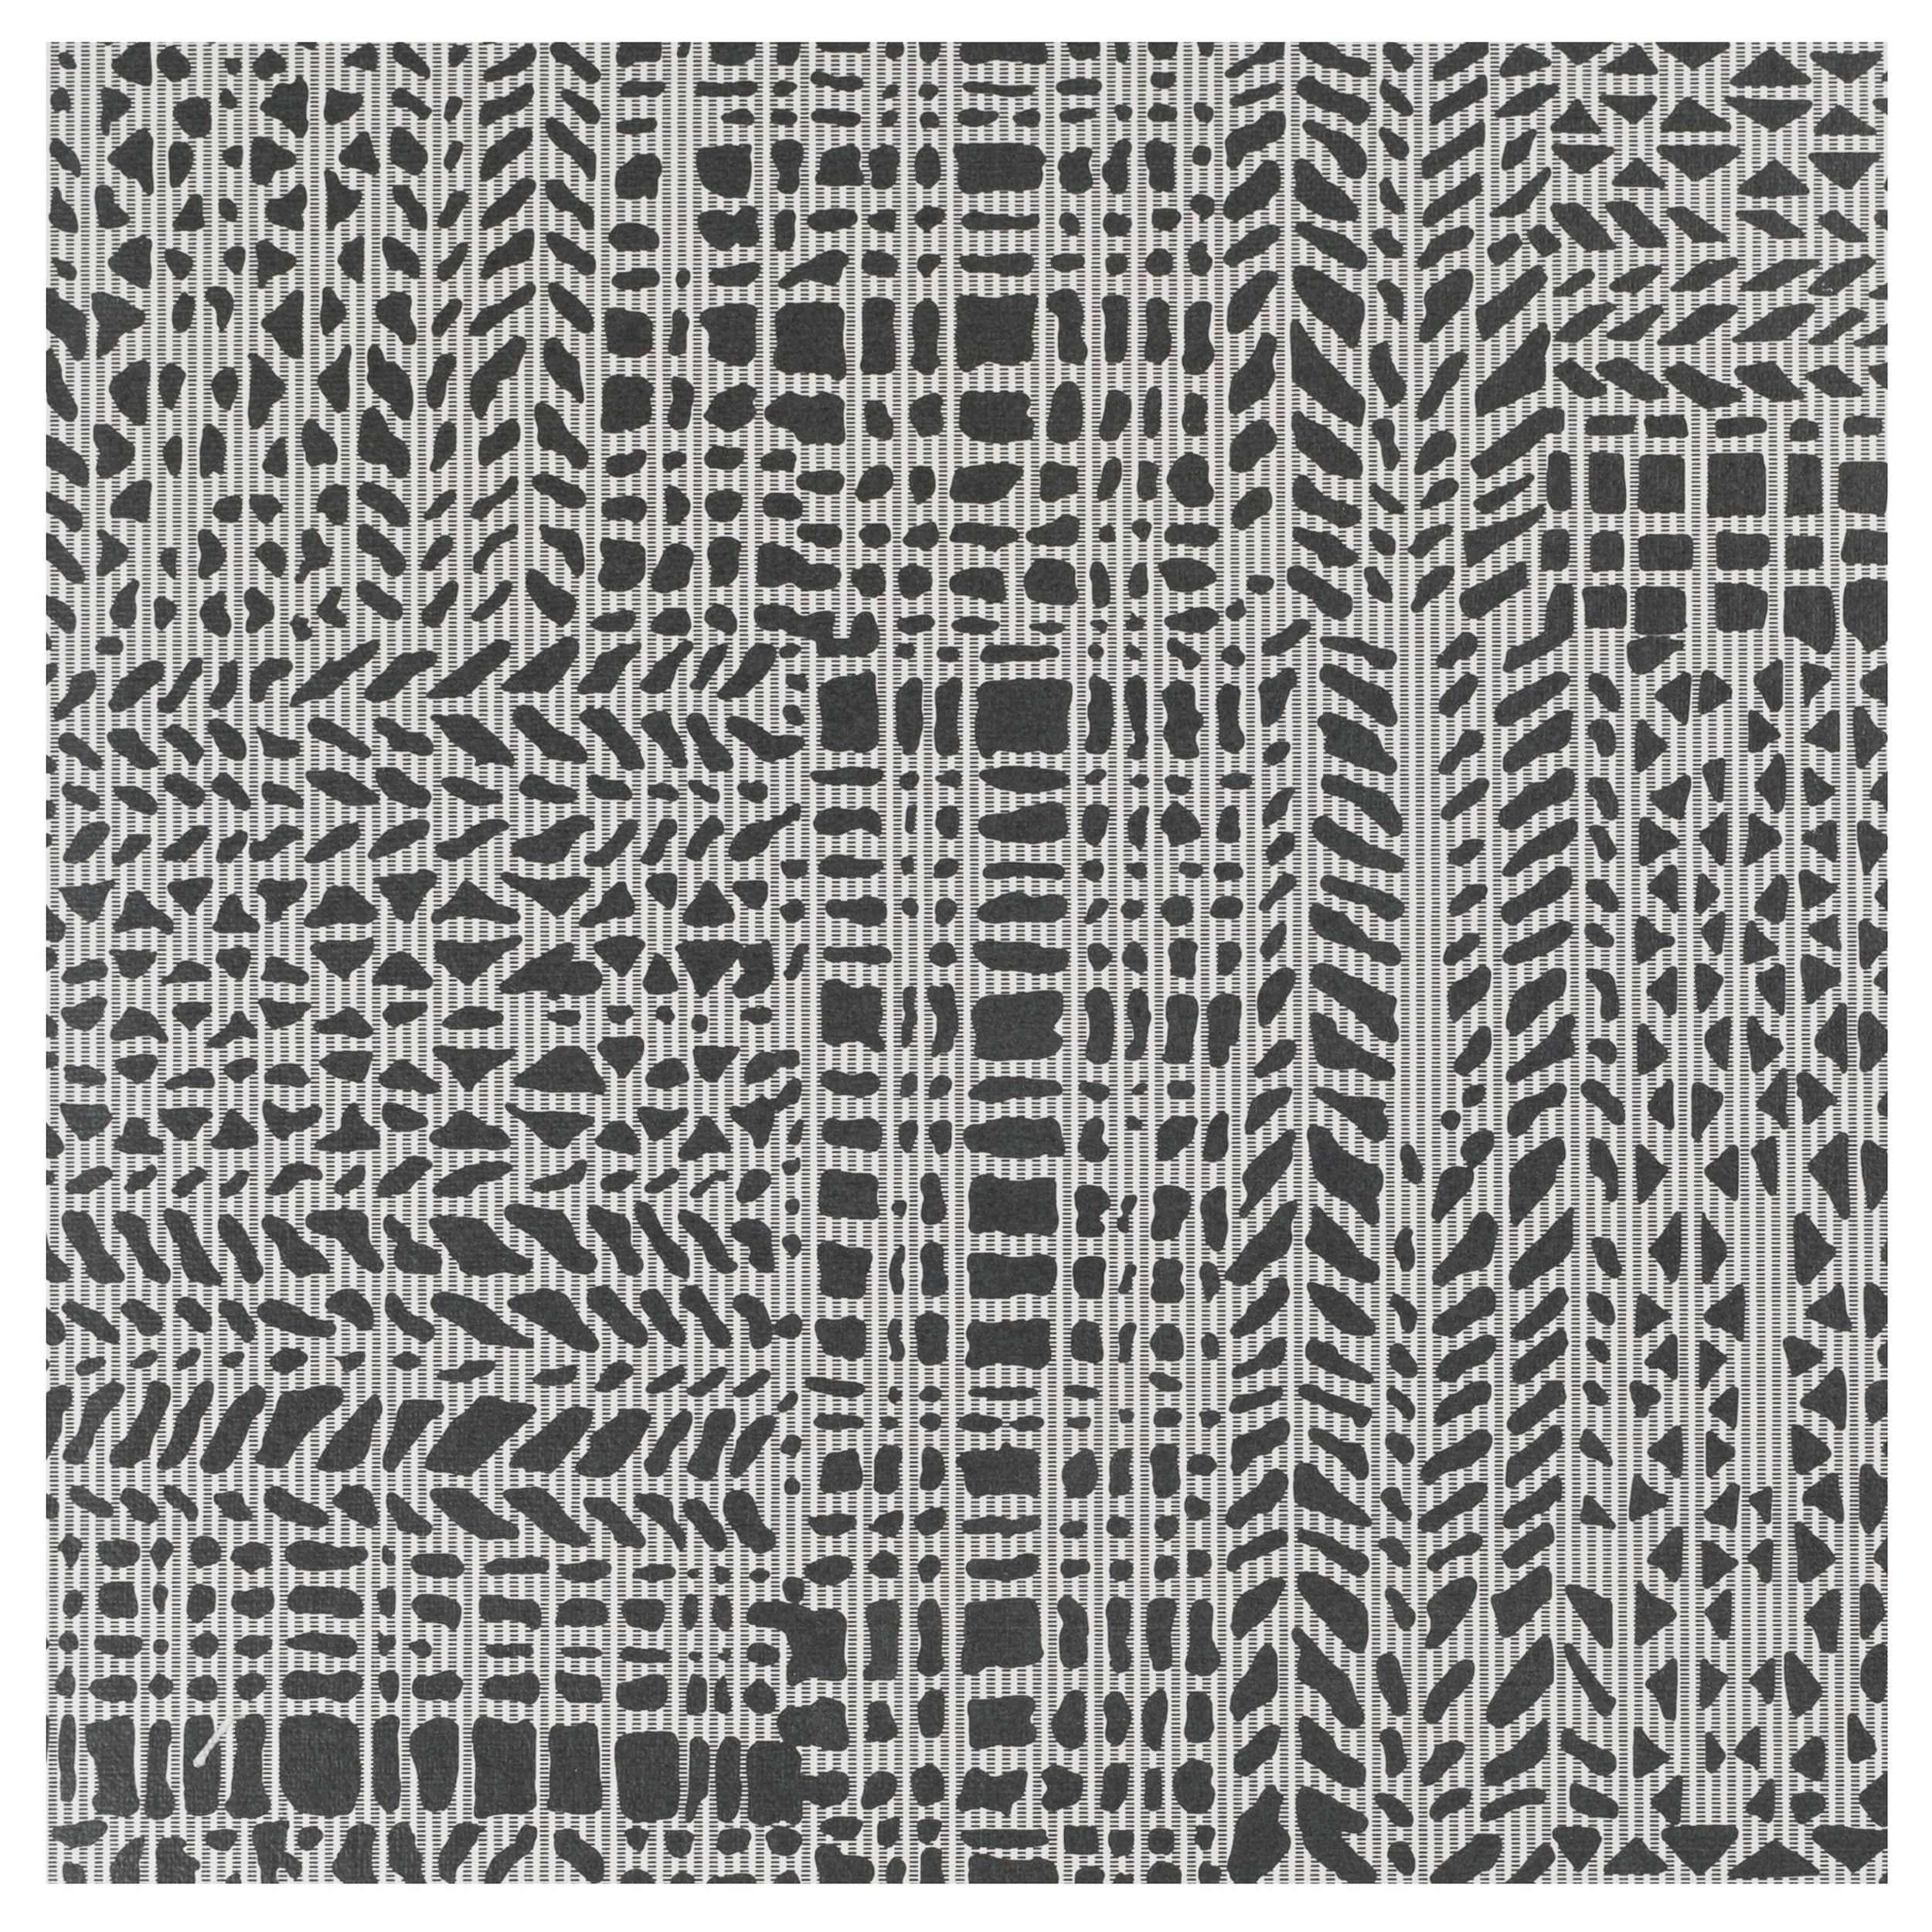 Ckilom Super Soft Home Living Room Rug 10mm Pile Faux Fur Rugs Carpet Plain Dark 10mm In 2020 Rugs In Living Room Home Living Room Room Rugs